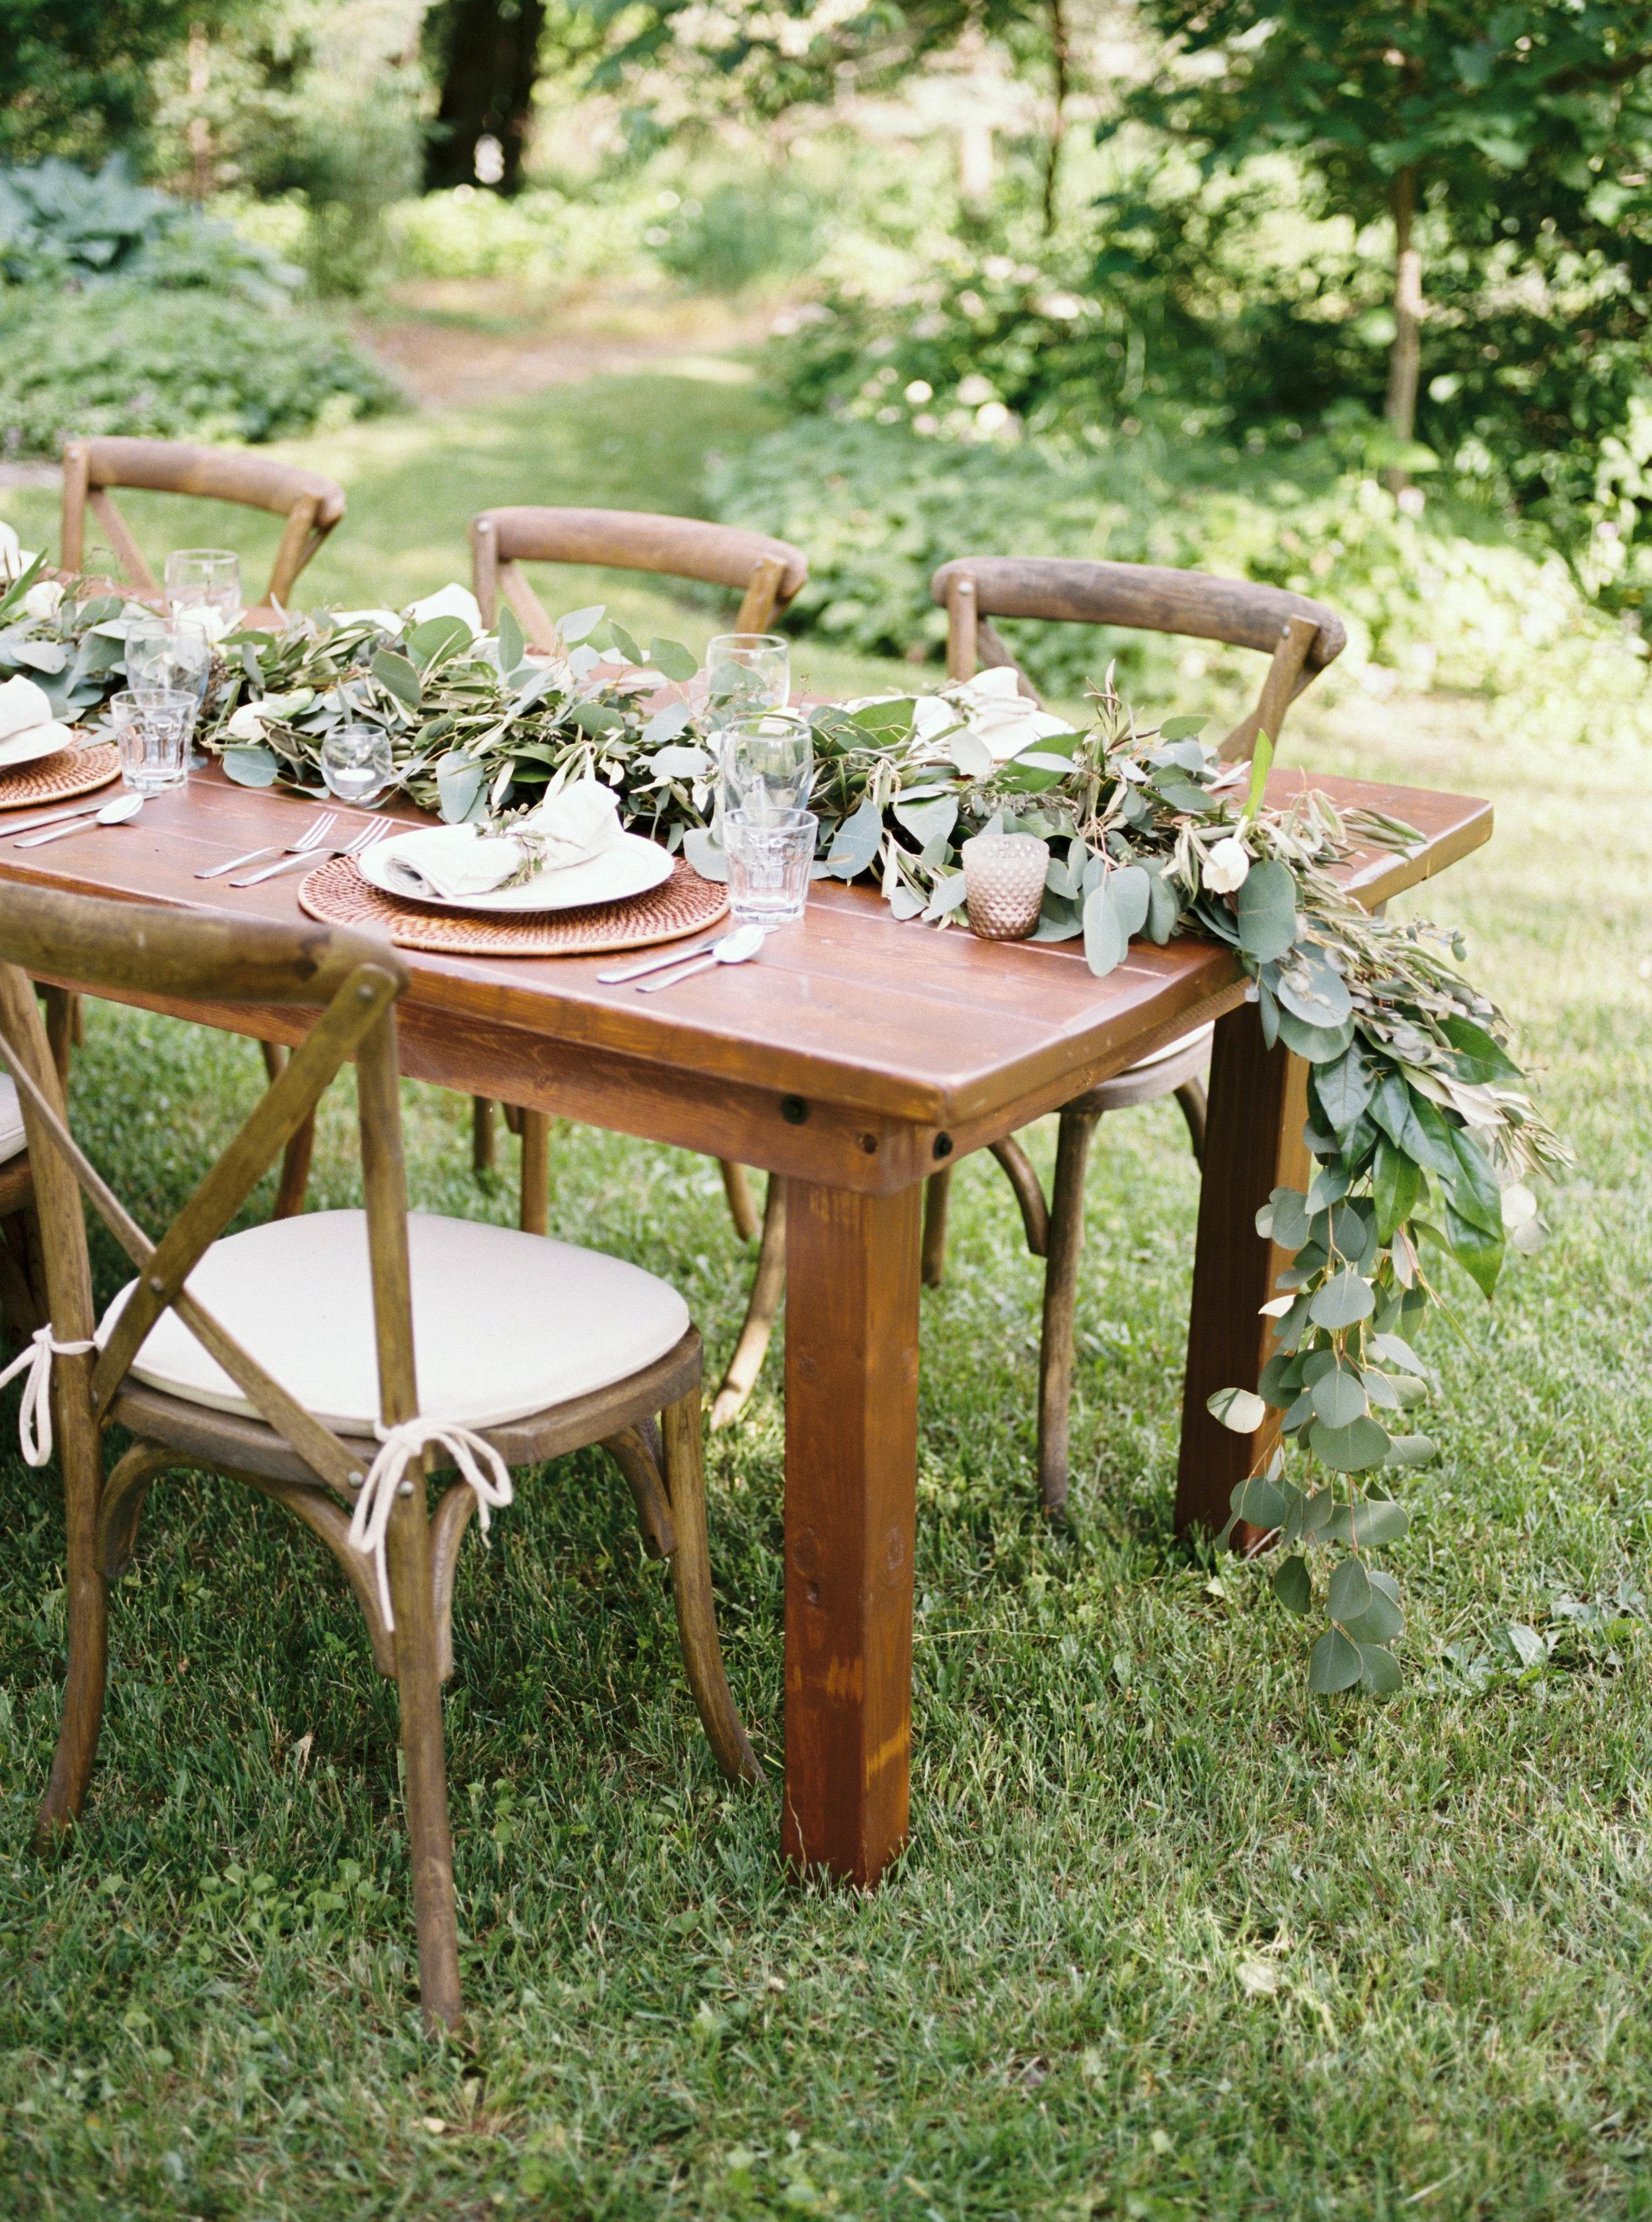 greenhouse-wedding-inspiration-by-laurelyn-savannah-photography-13.jpg